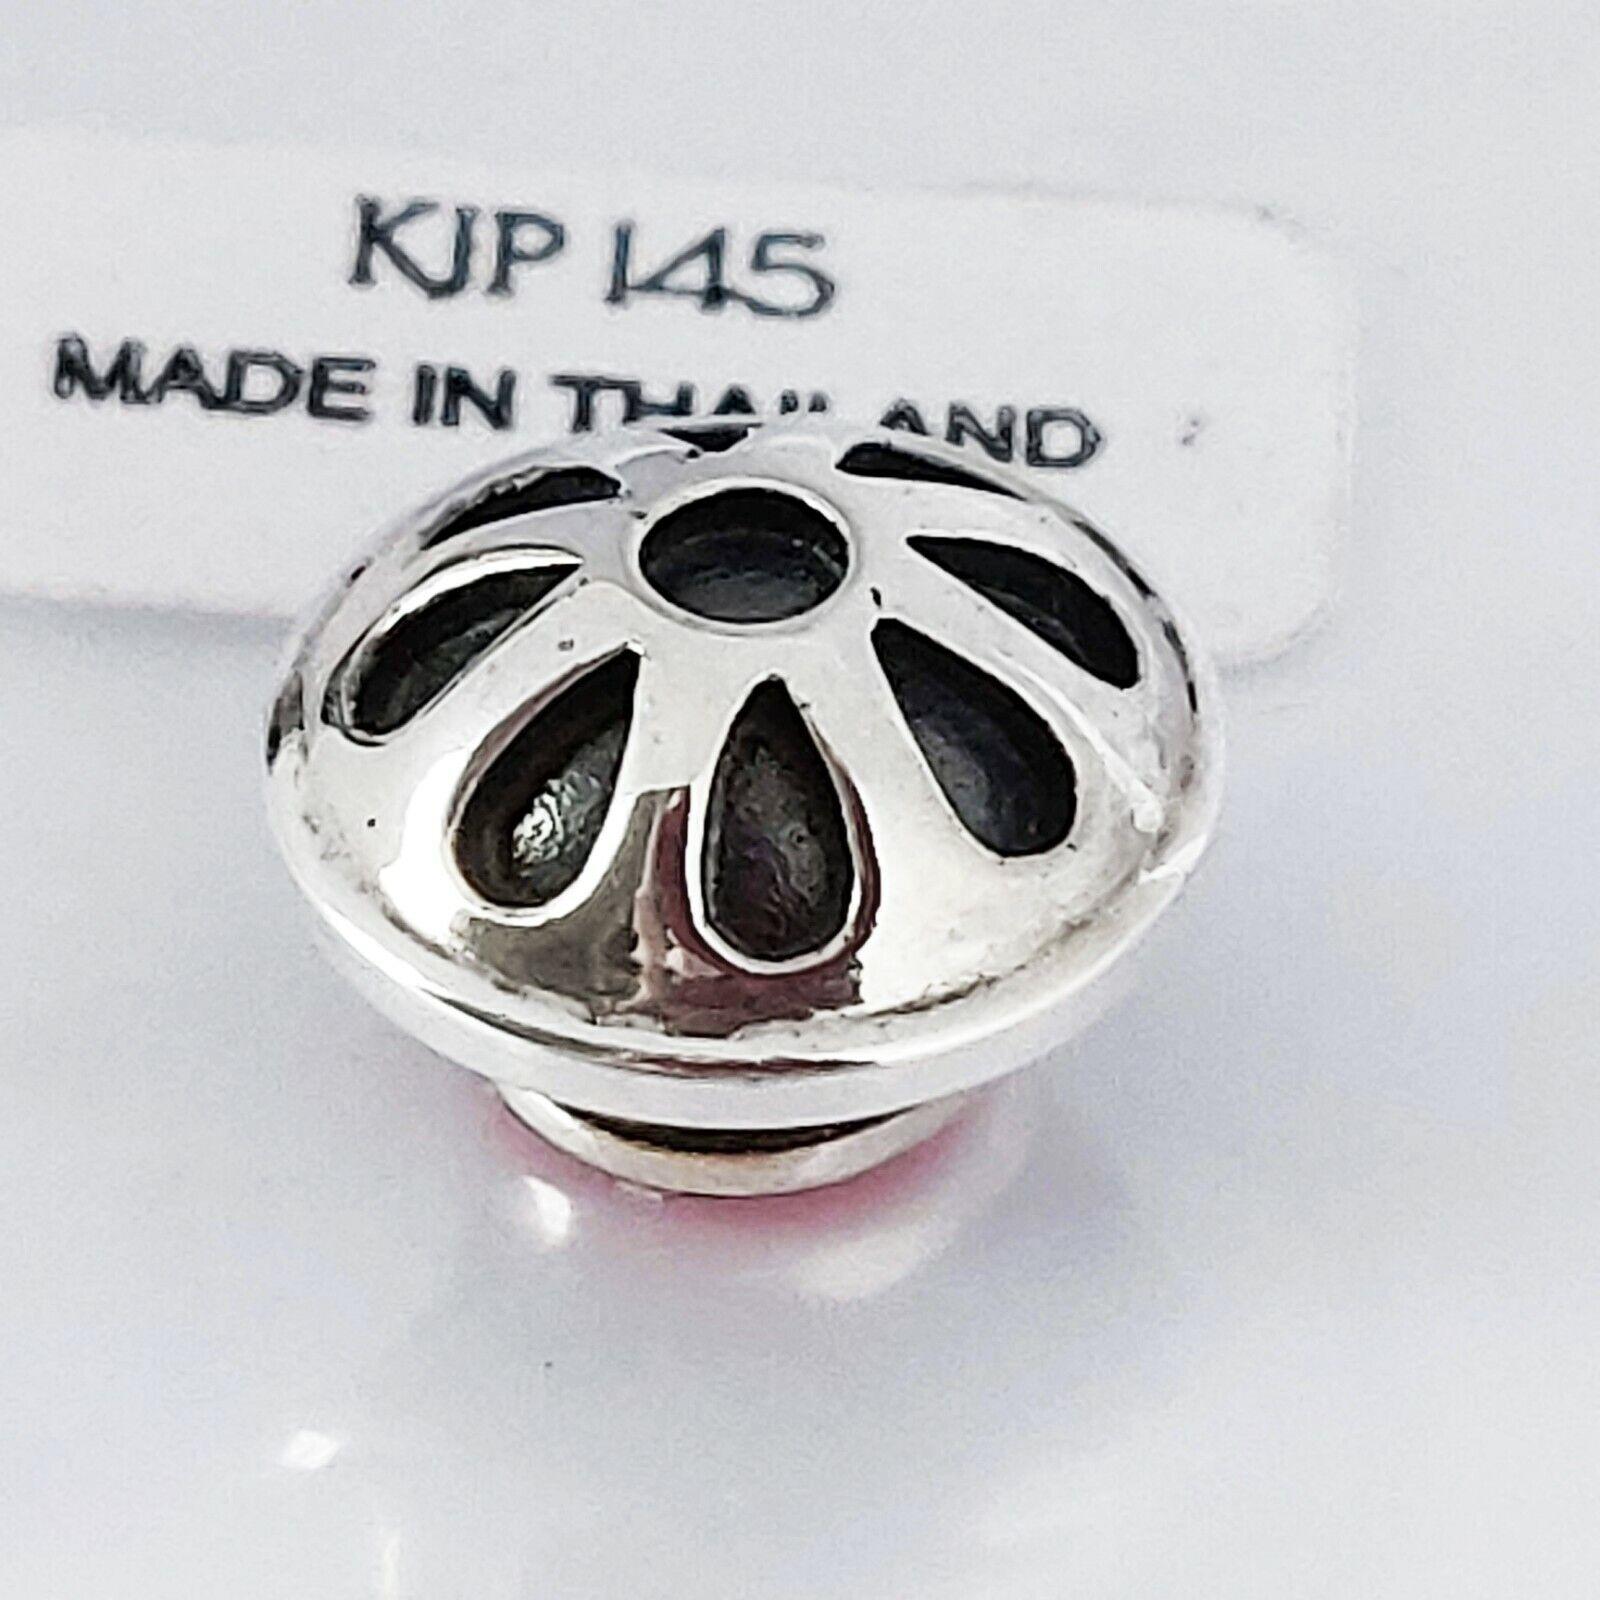 Kameleon KJP145 Sterling Silver Bali Hai 4 JewelPop Authentic New